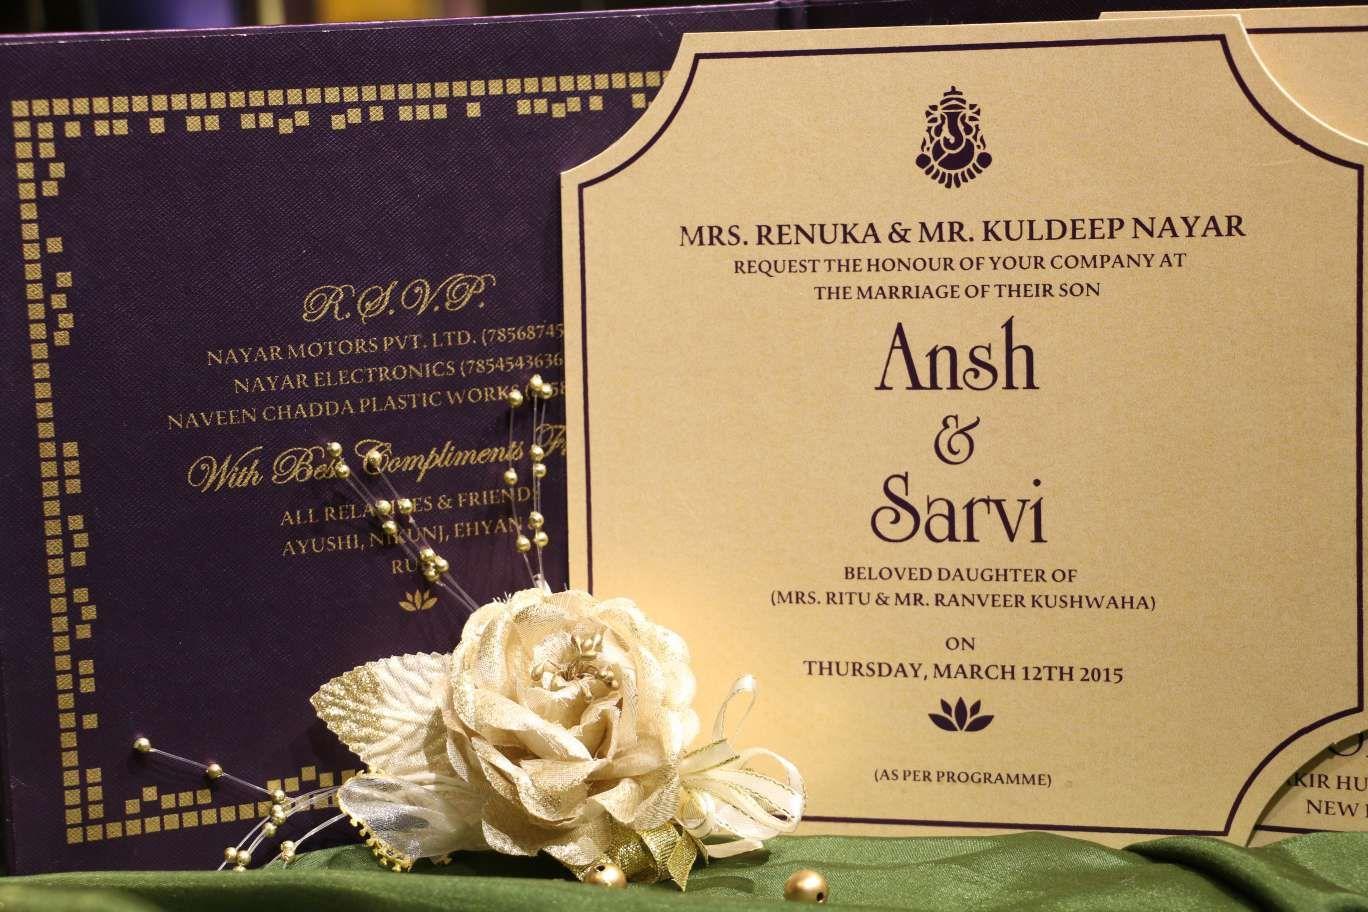 wedding cards sri lanka wedding card pinterest wedding cards